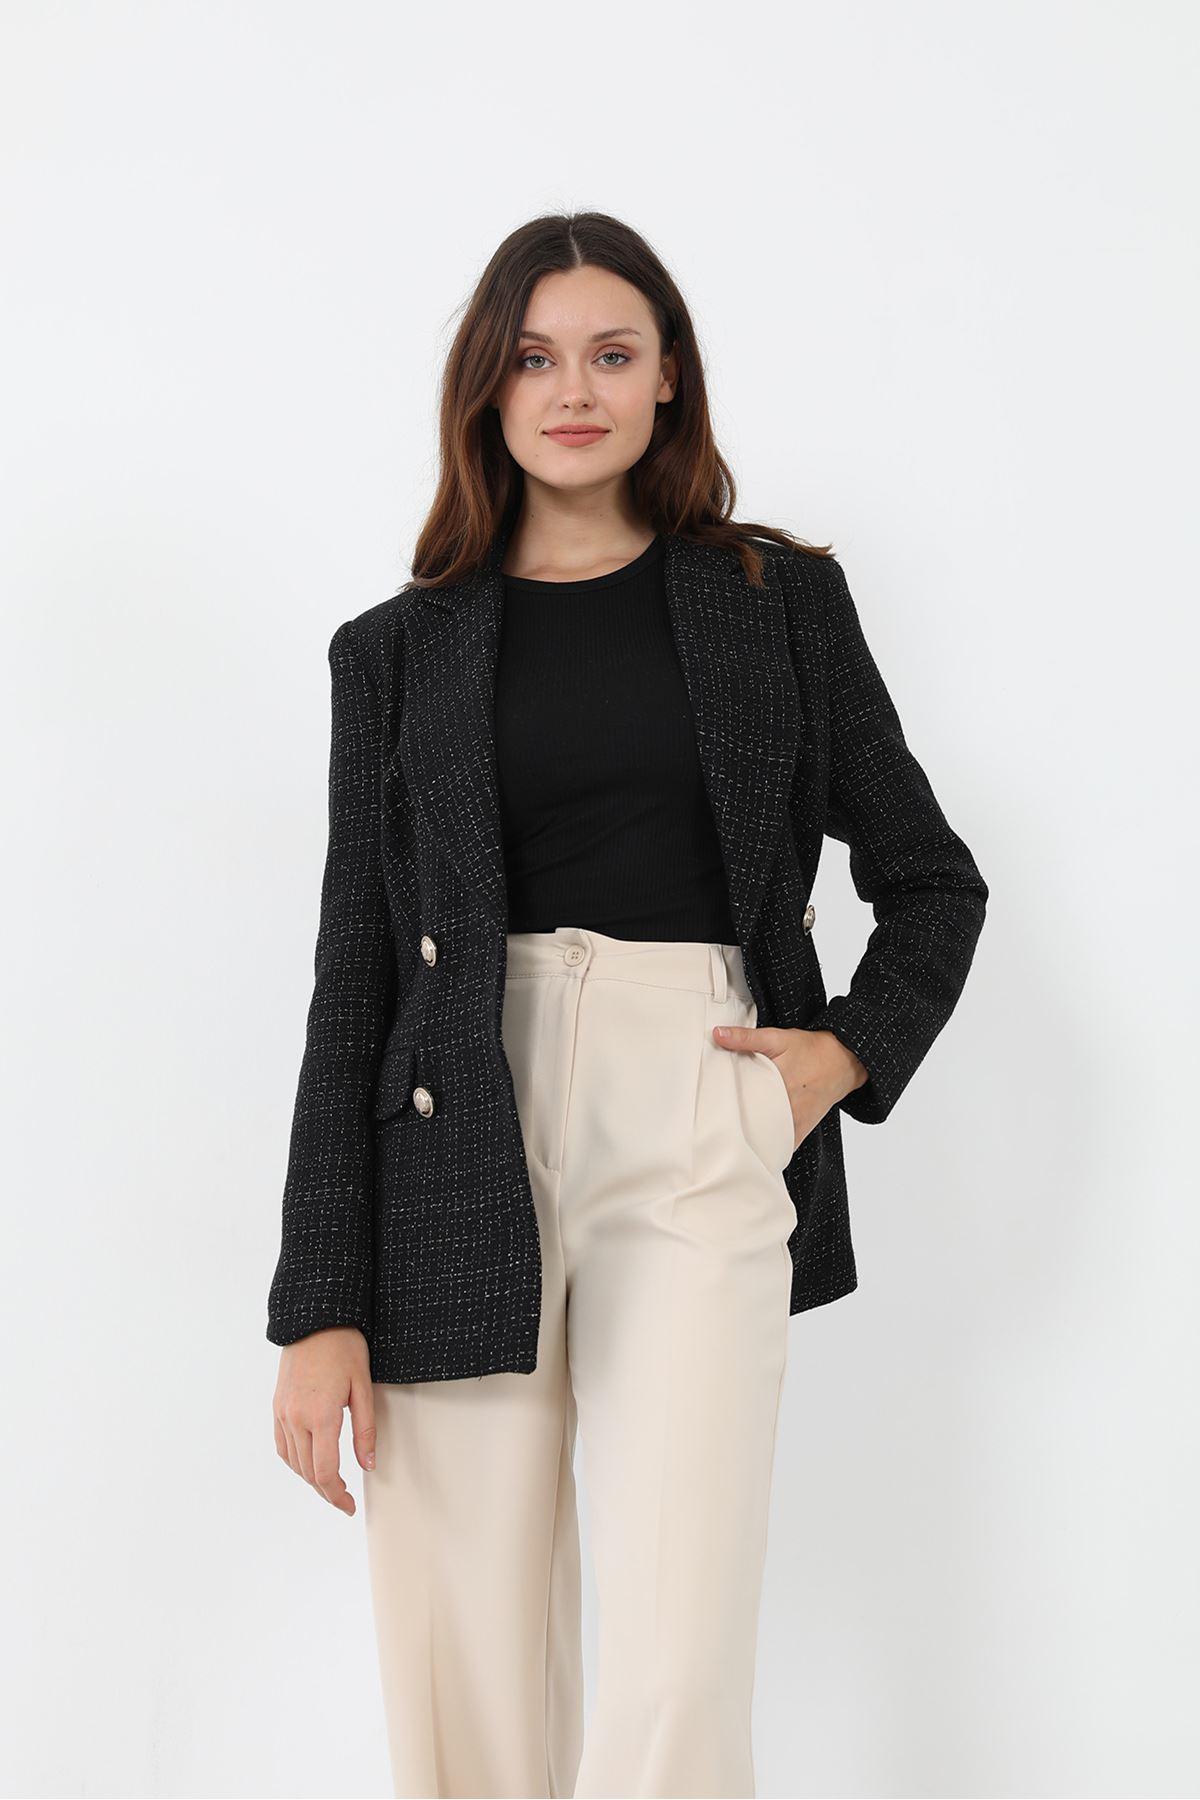 Simli Tuvit Ceket-Siyah